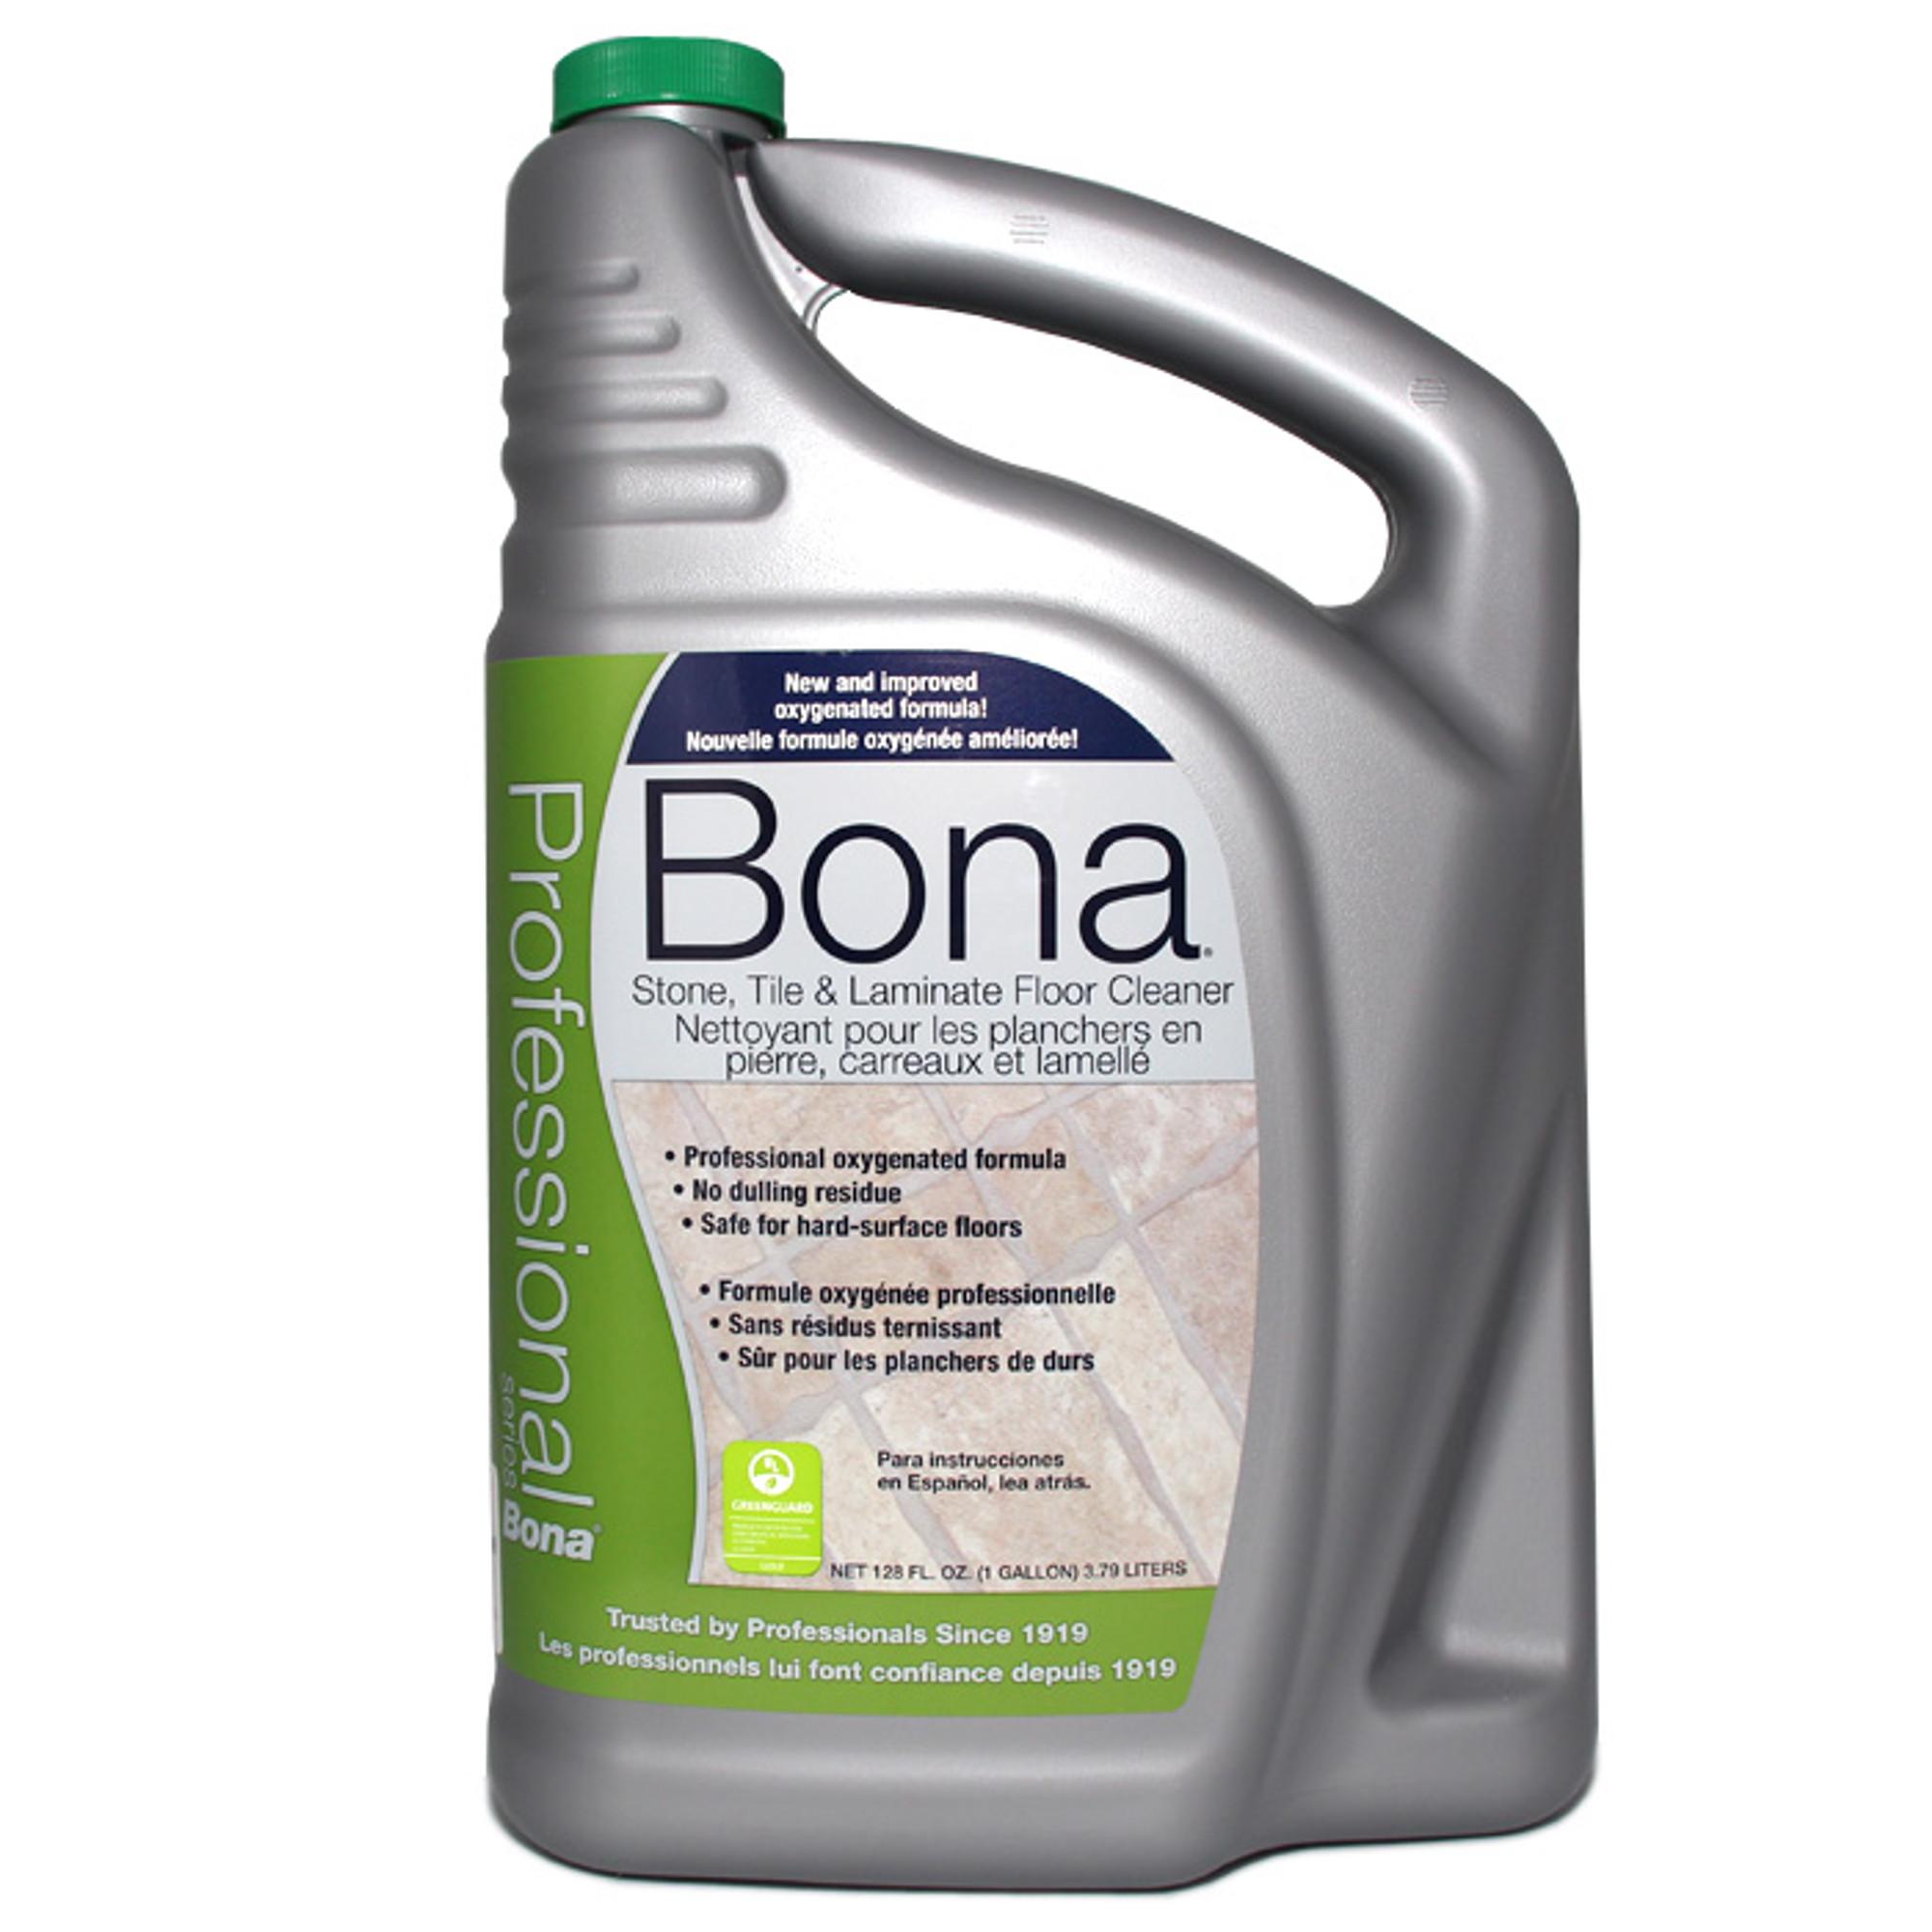 bona stone tile laminate cleaner refill 1gal